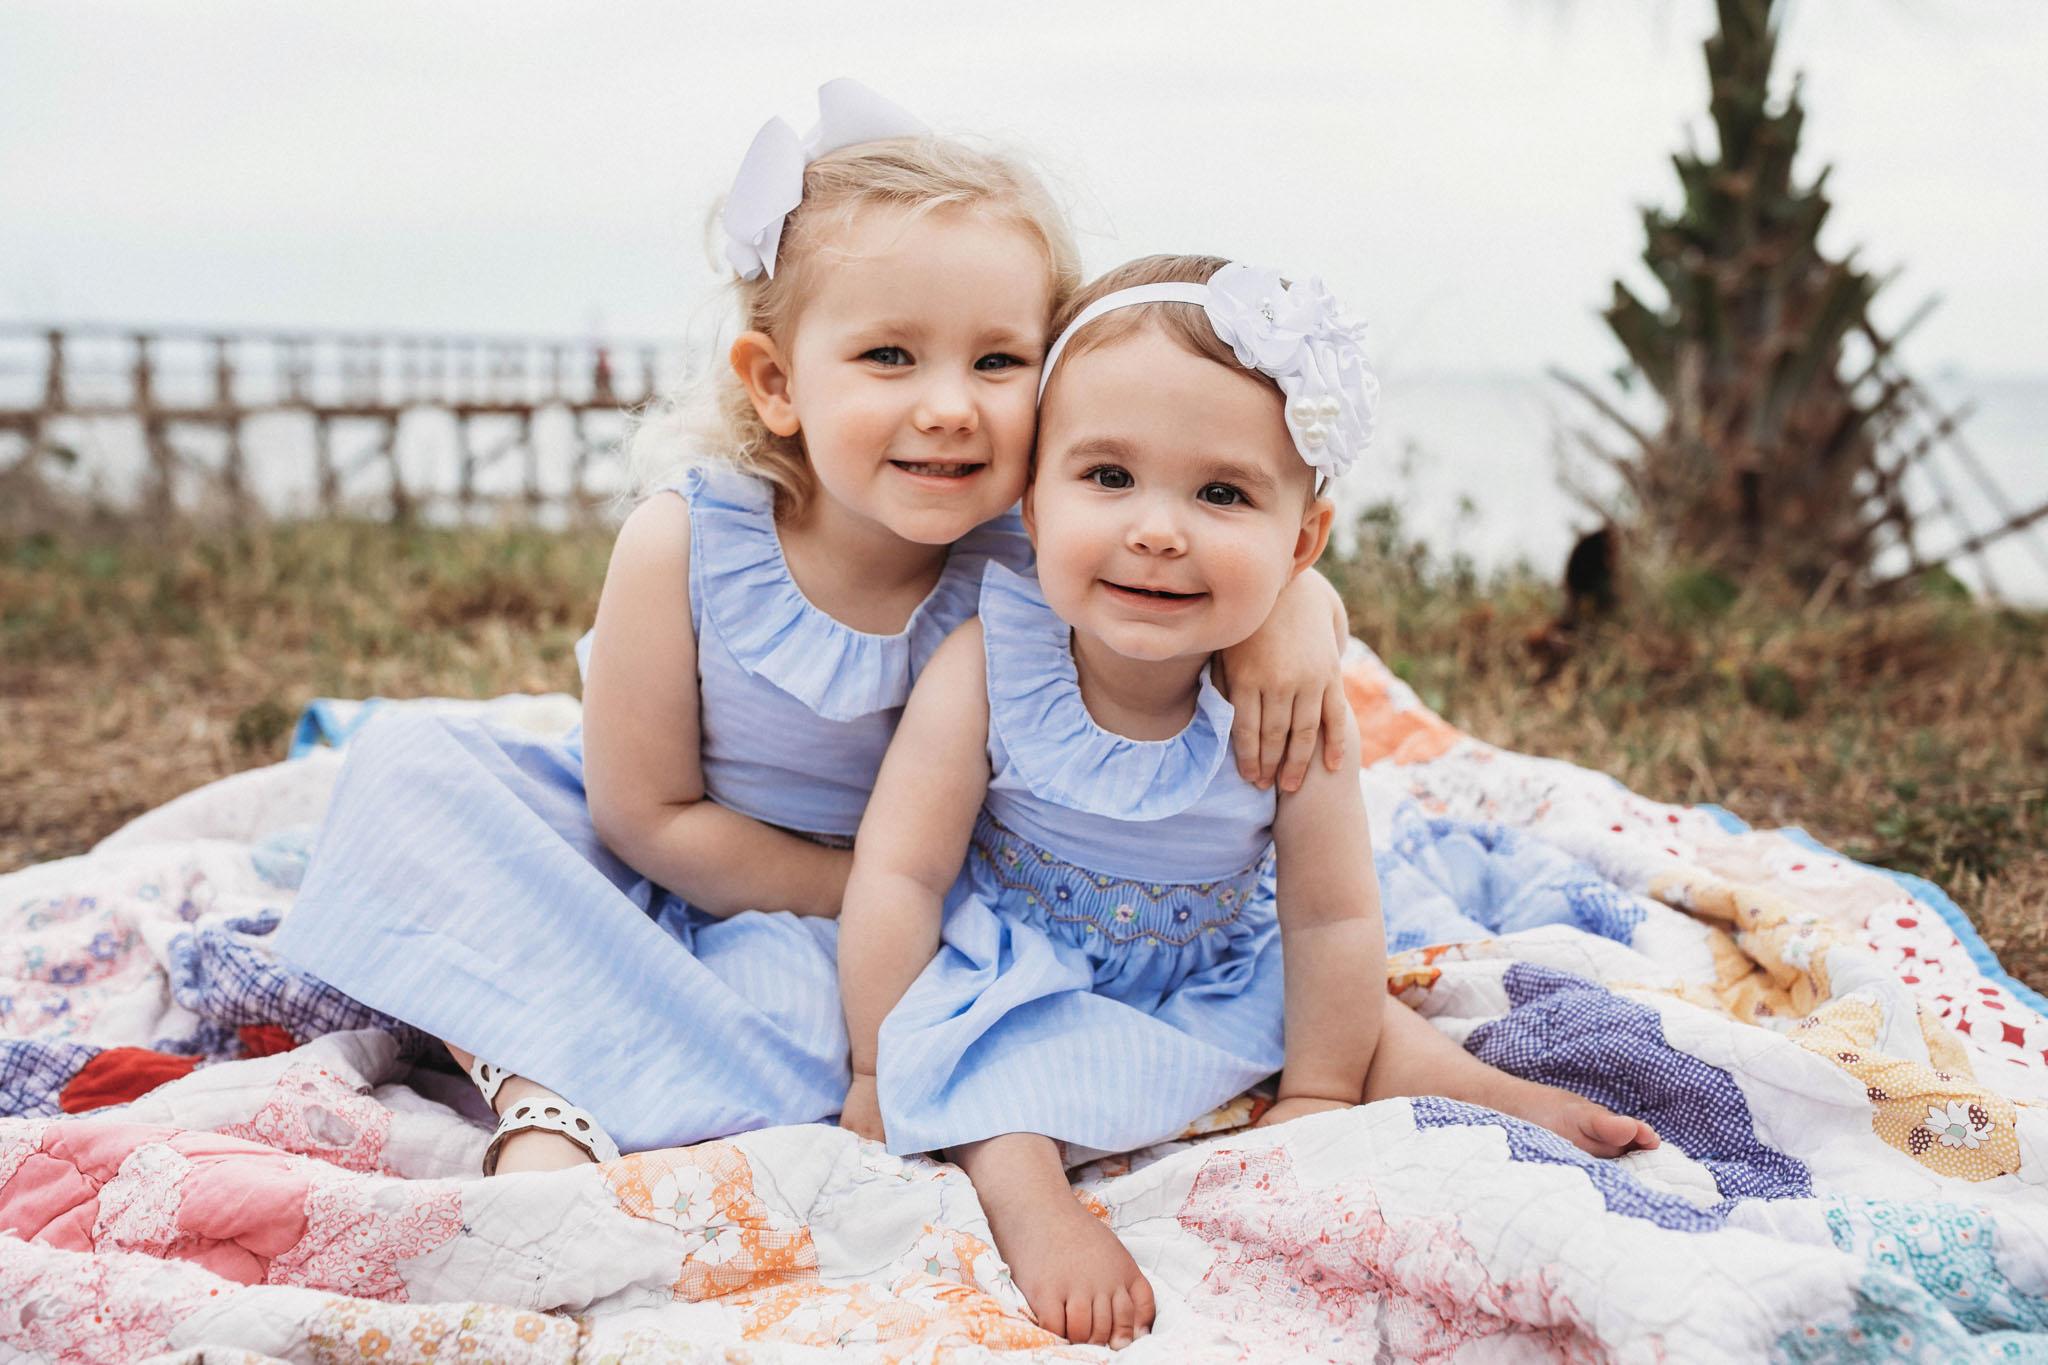 Tampa Family Photographer_Jennifer Kielich Photography_Jill S Family For Blog-3.jpg